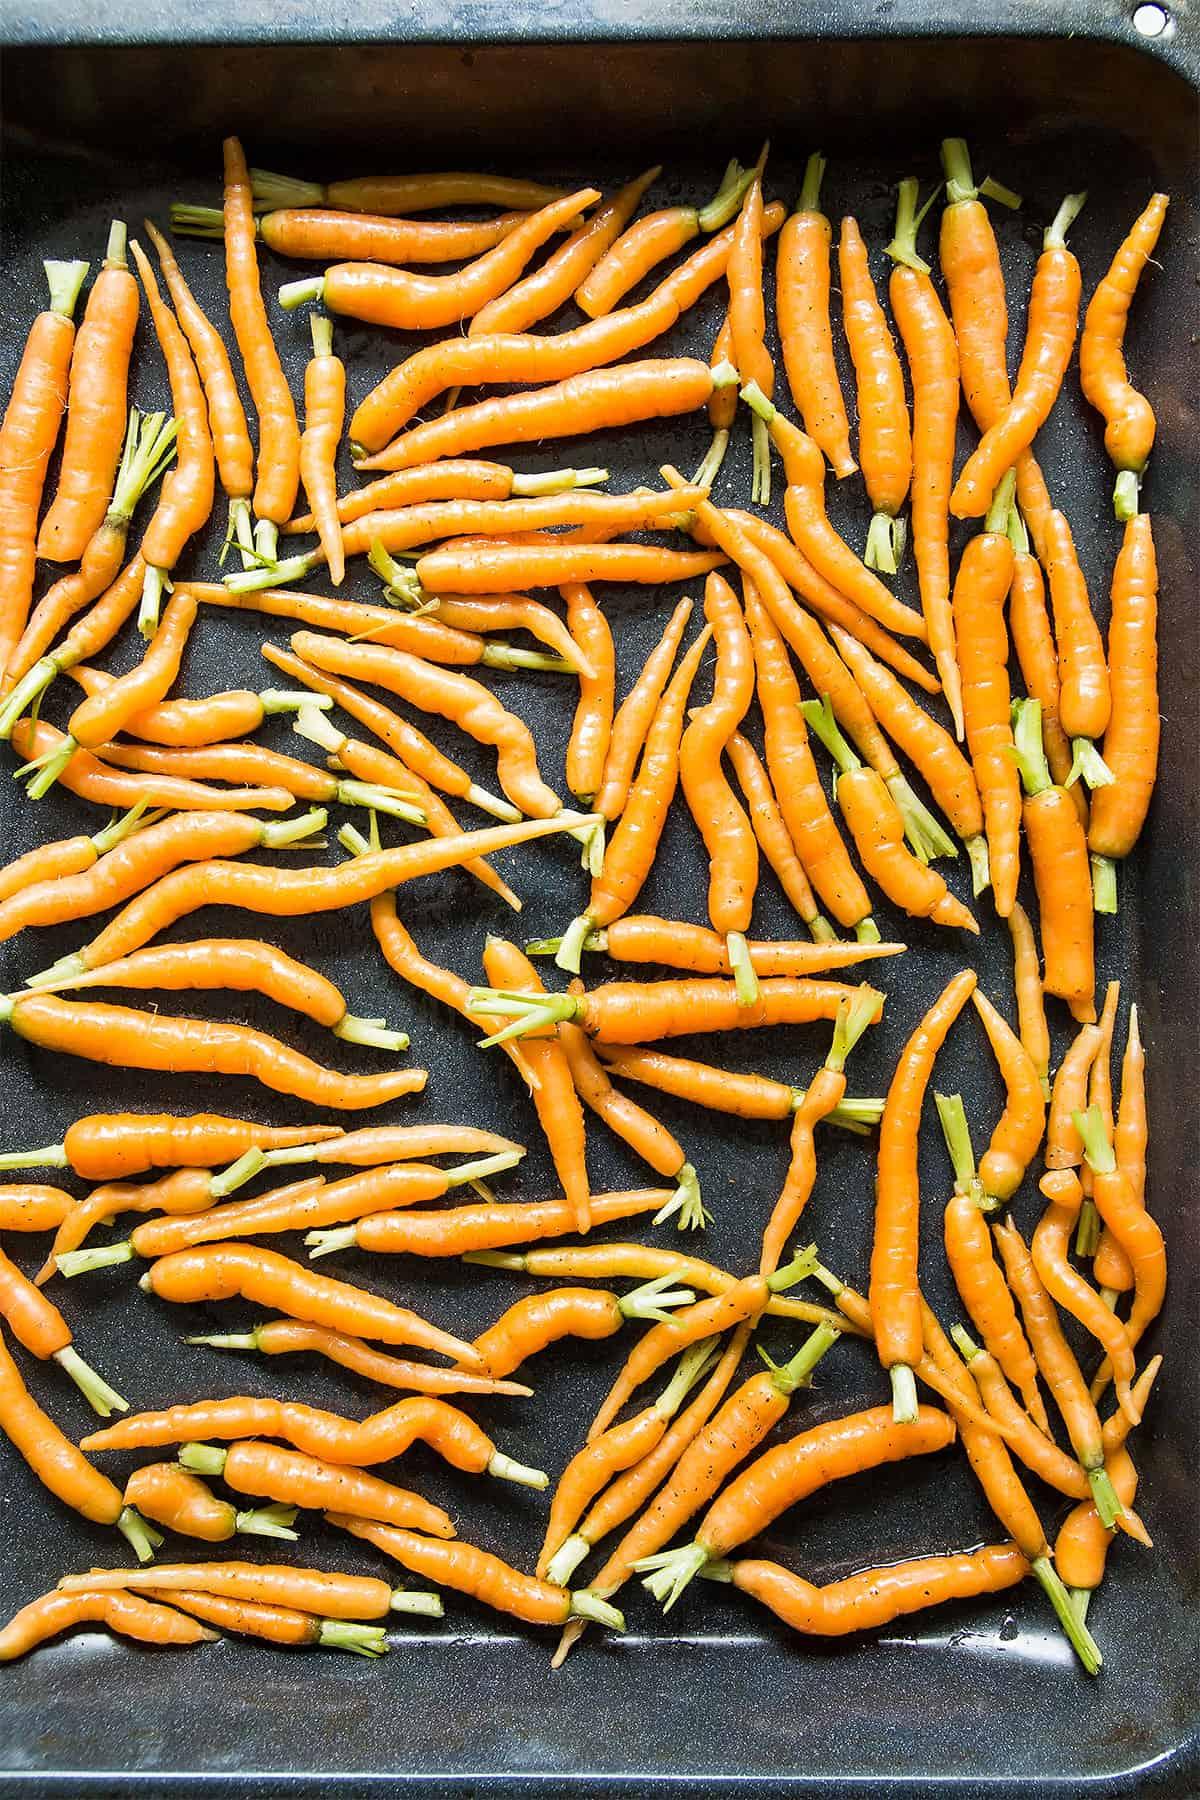 Baby Carrots in Roasting Pan